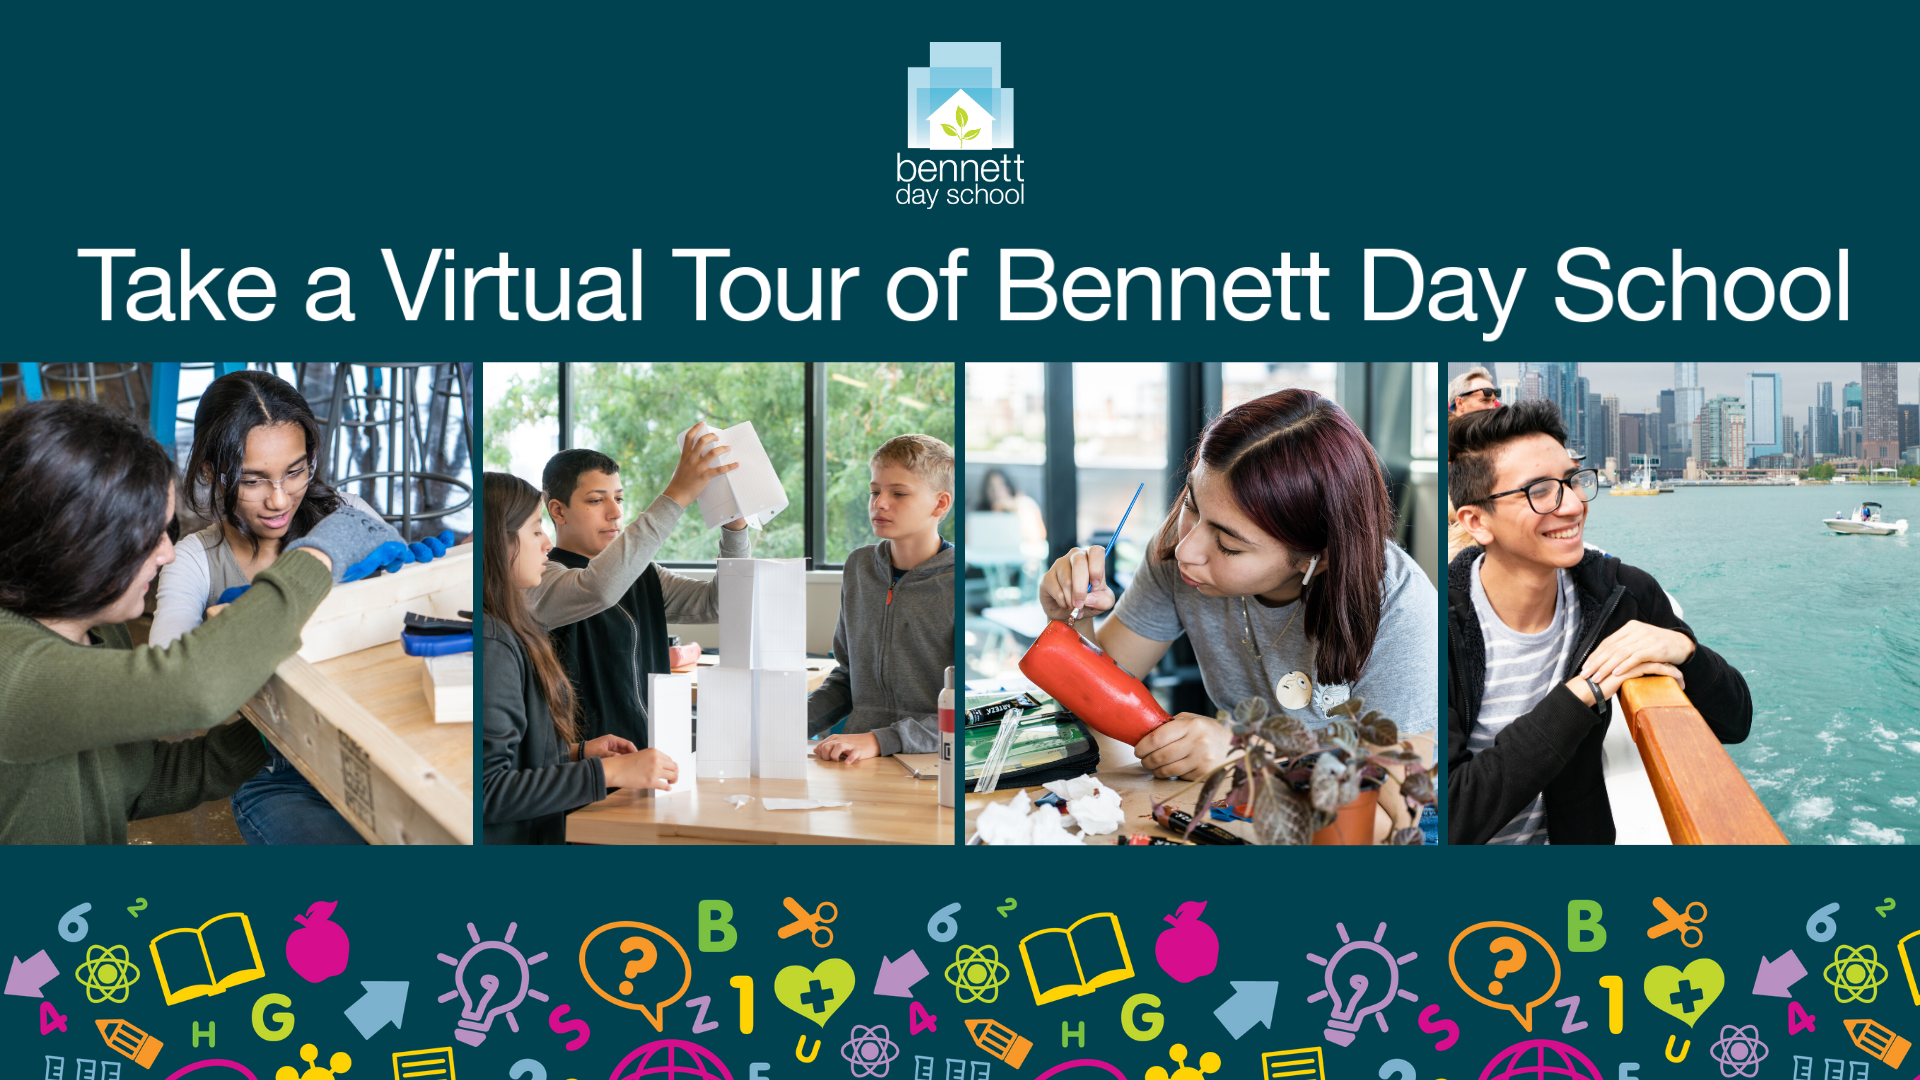 Bennett Day School Virtual Tour Trailer (Grades 6-12)